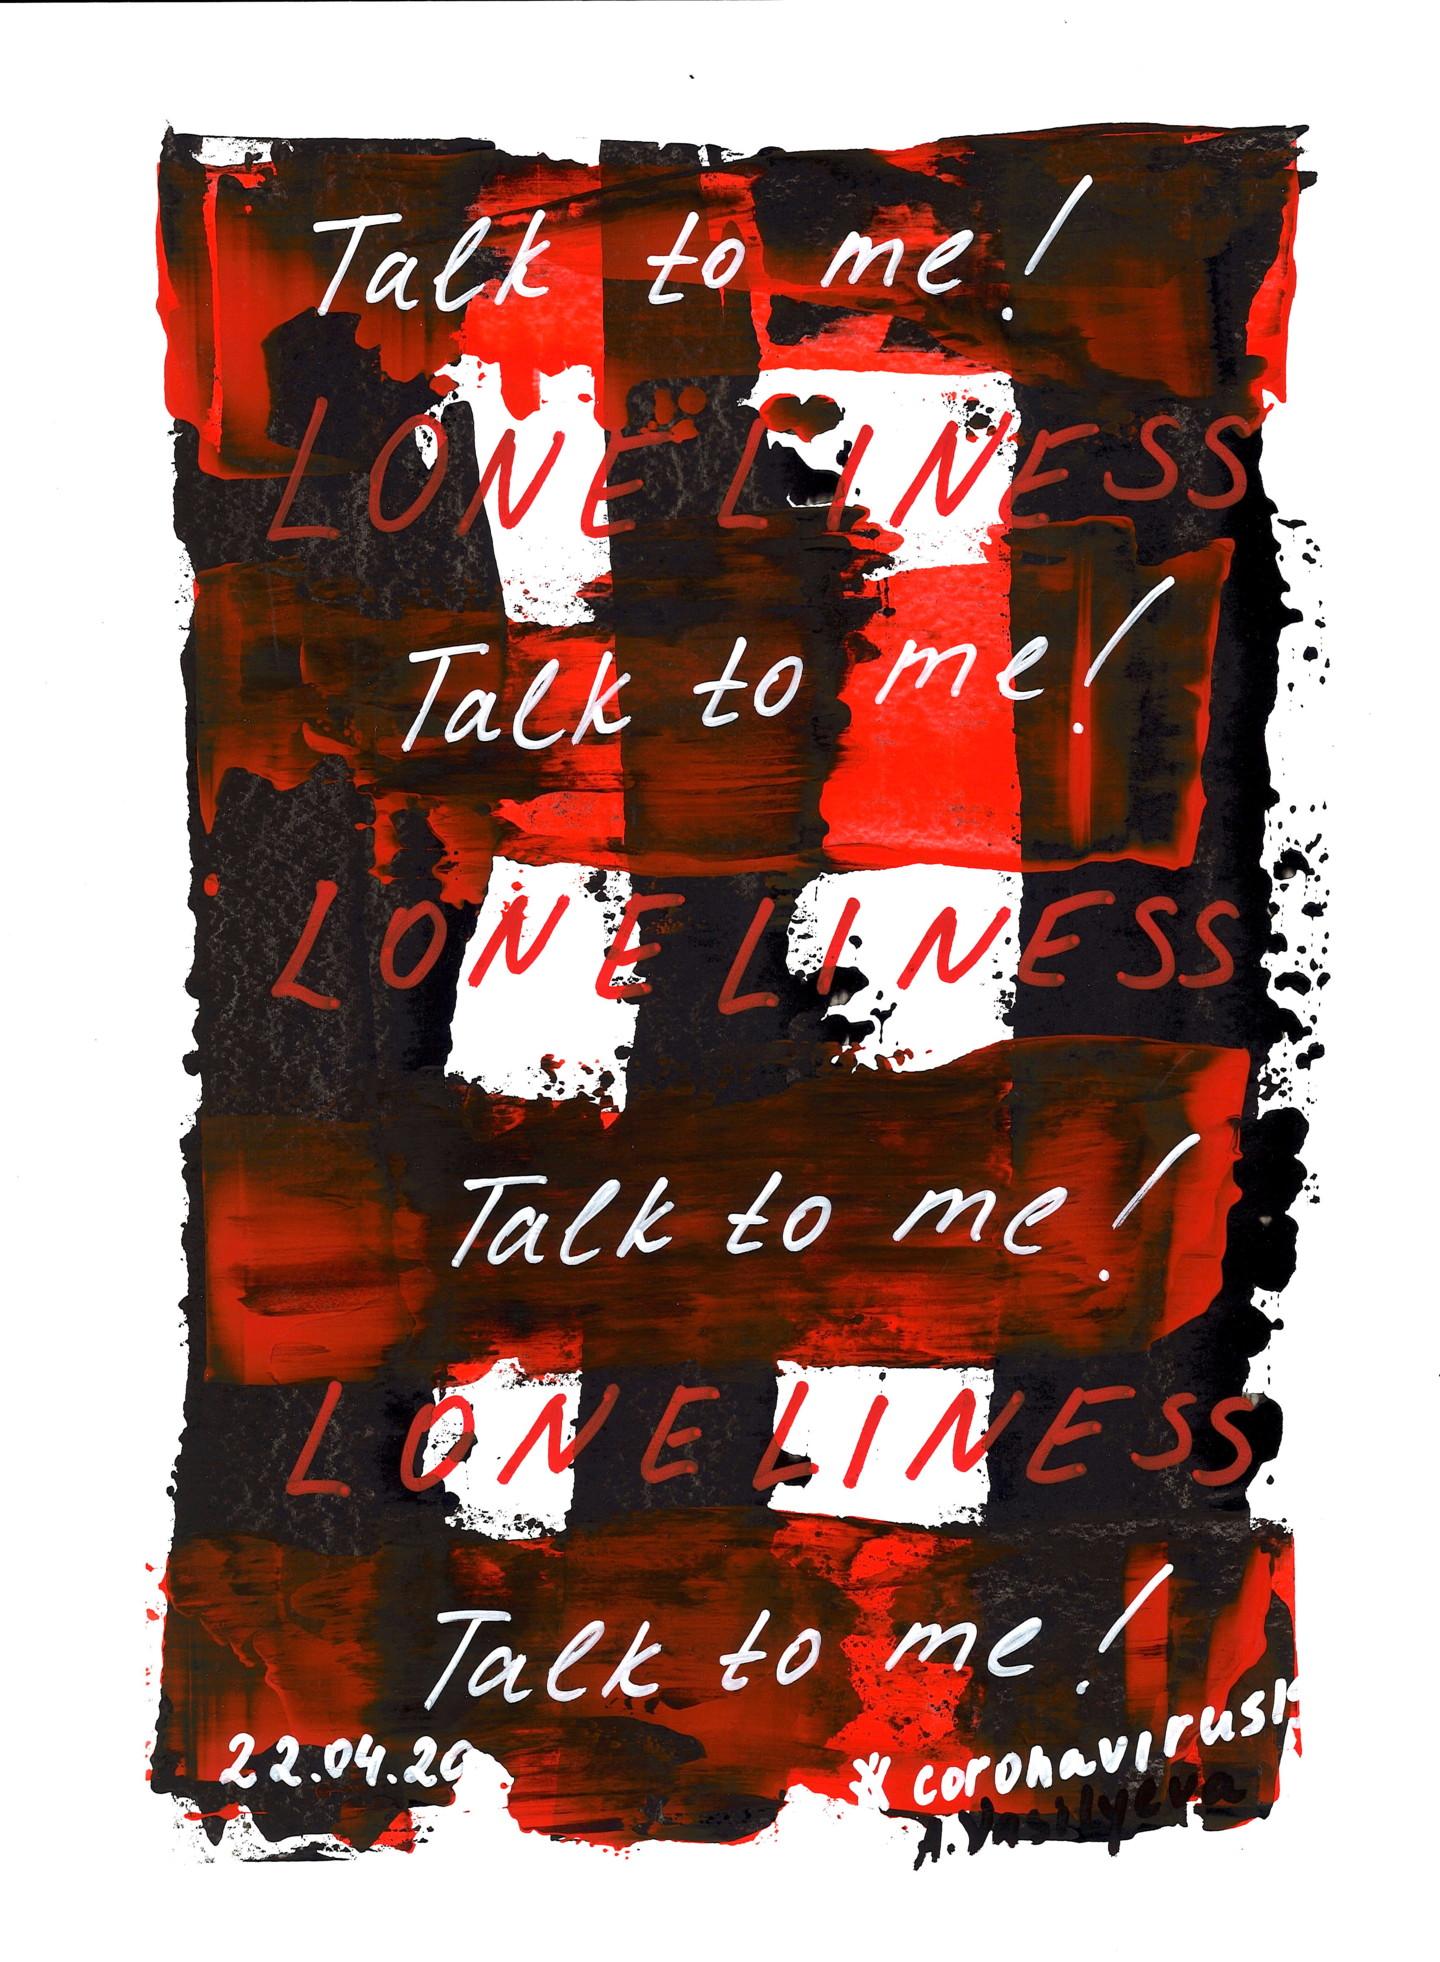 Anastasia Vasilyeva - 22.04.2020 - Talk to me! COVID-19 Documentary art.